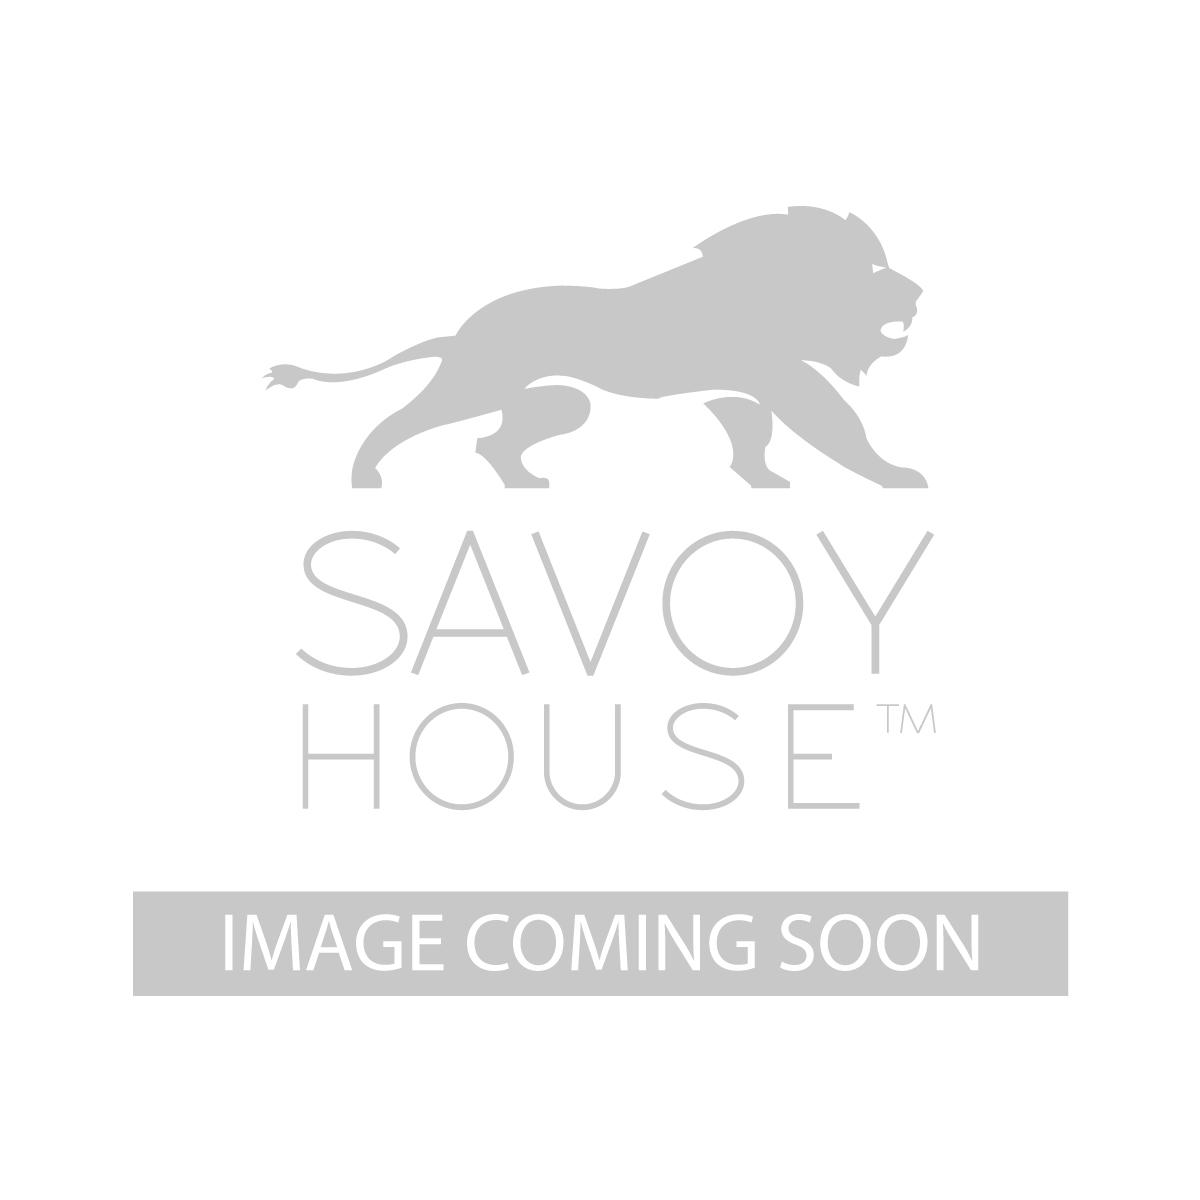 5 258 13 Monte Grande Wall Mount Lantern By Savoy House